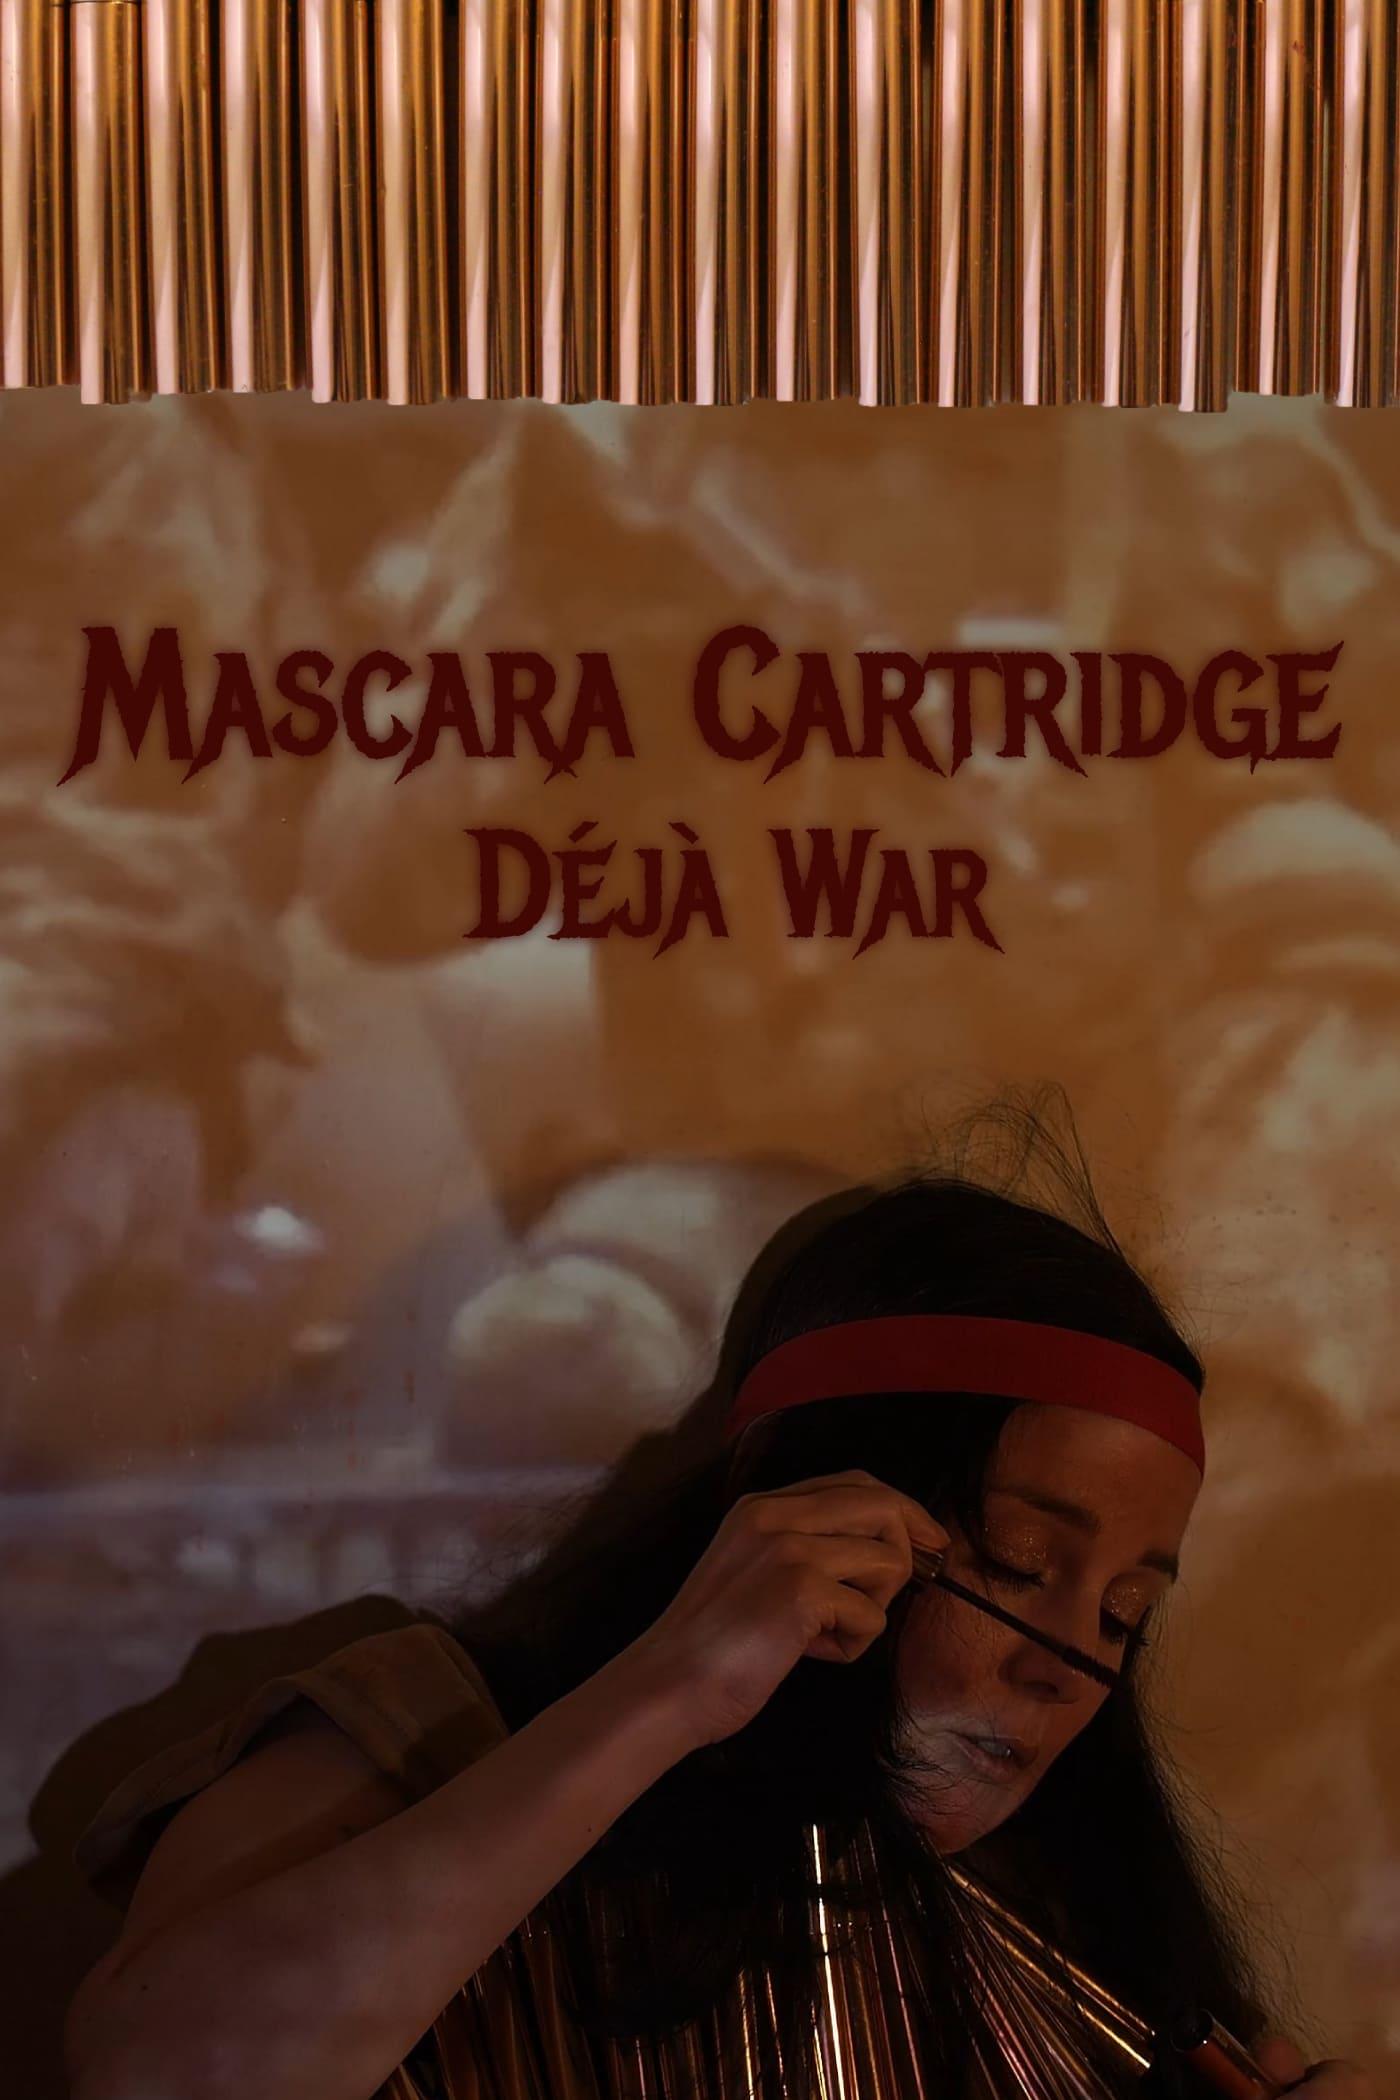 Mascara Cartridge Déjà War